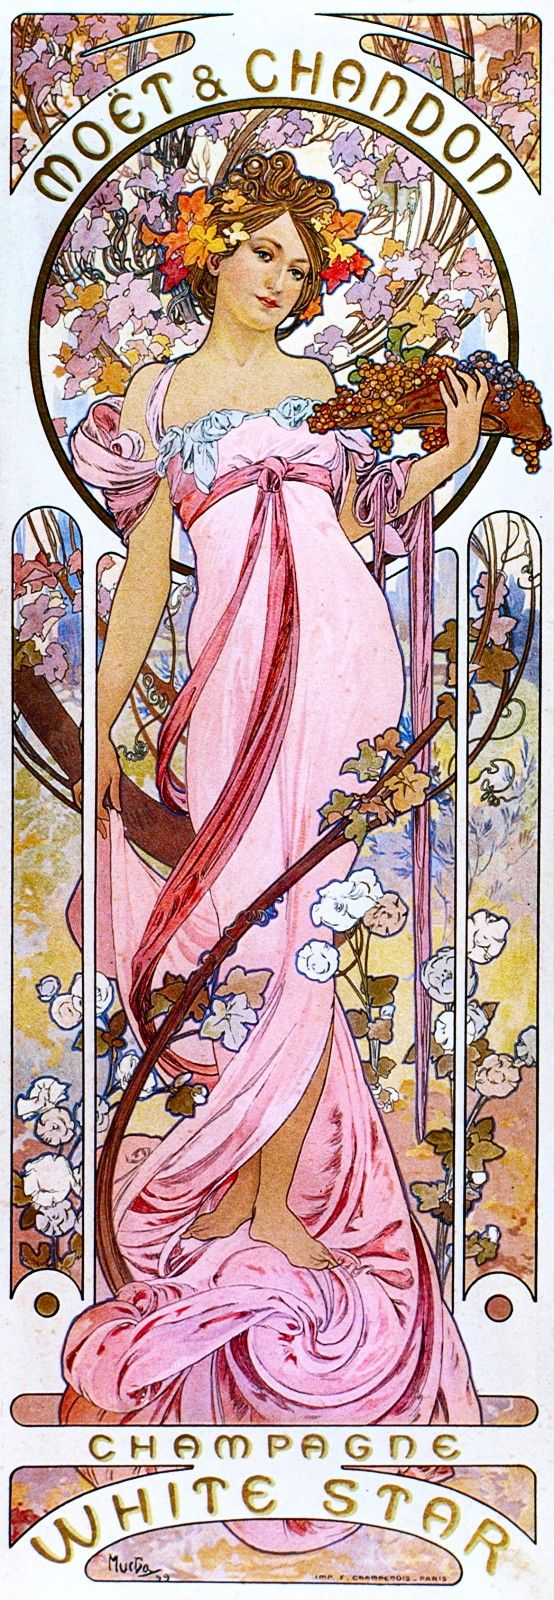 Moet & Chandon -White Star Alphonse Mucha, Arts décoratifs par…